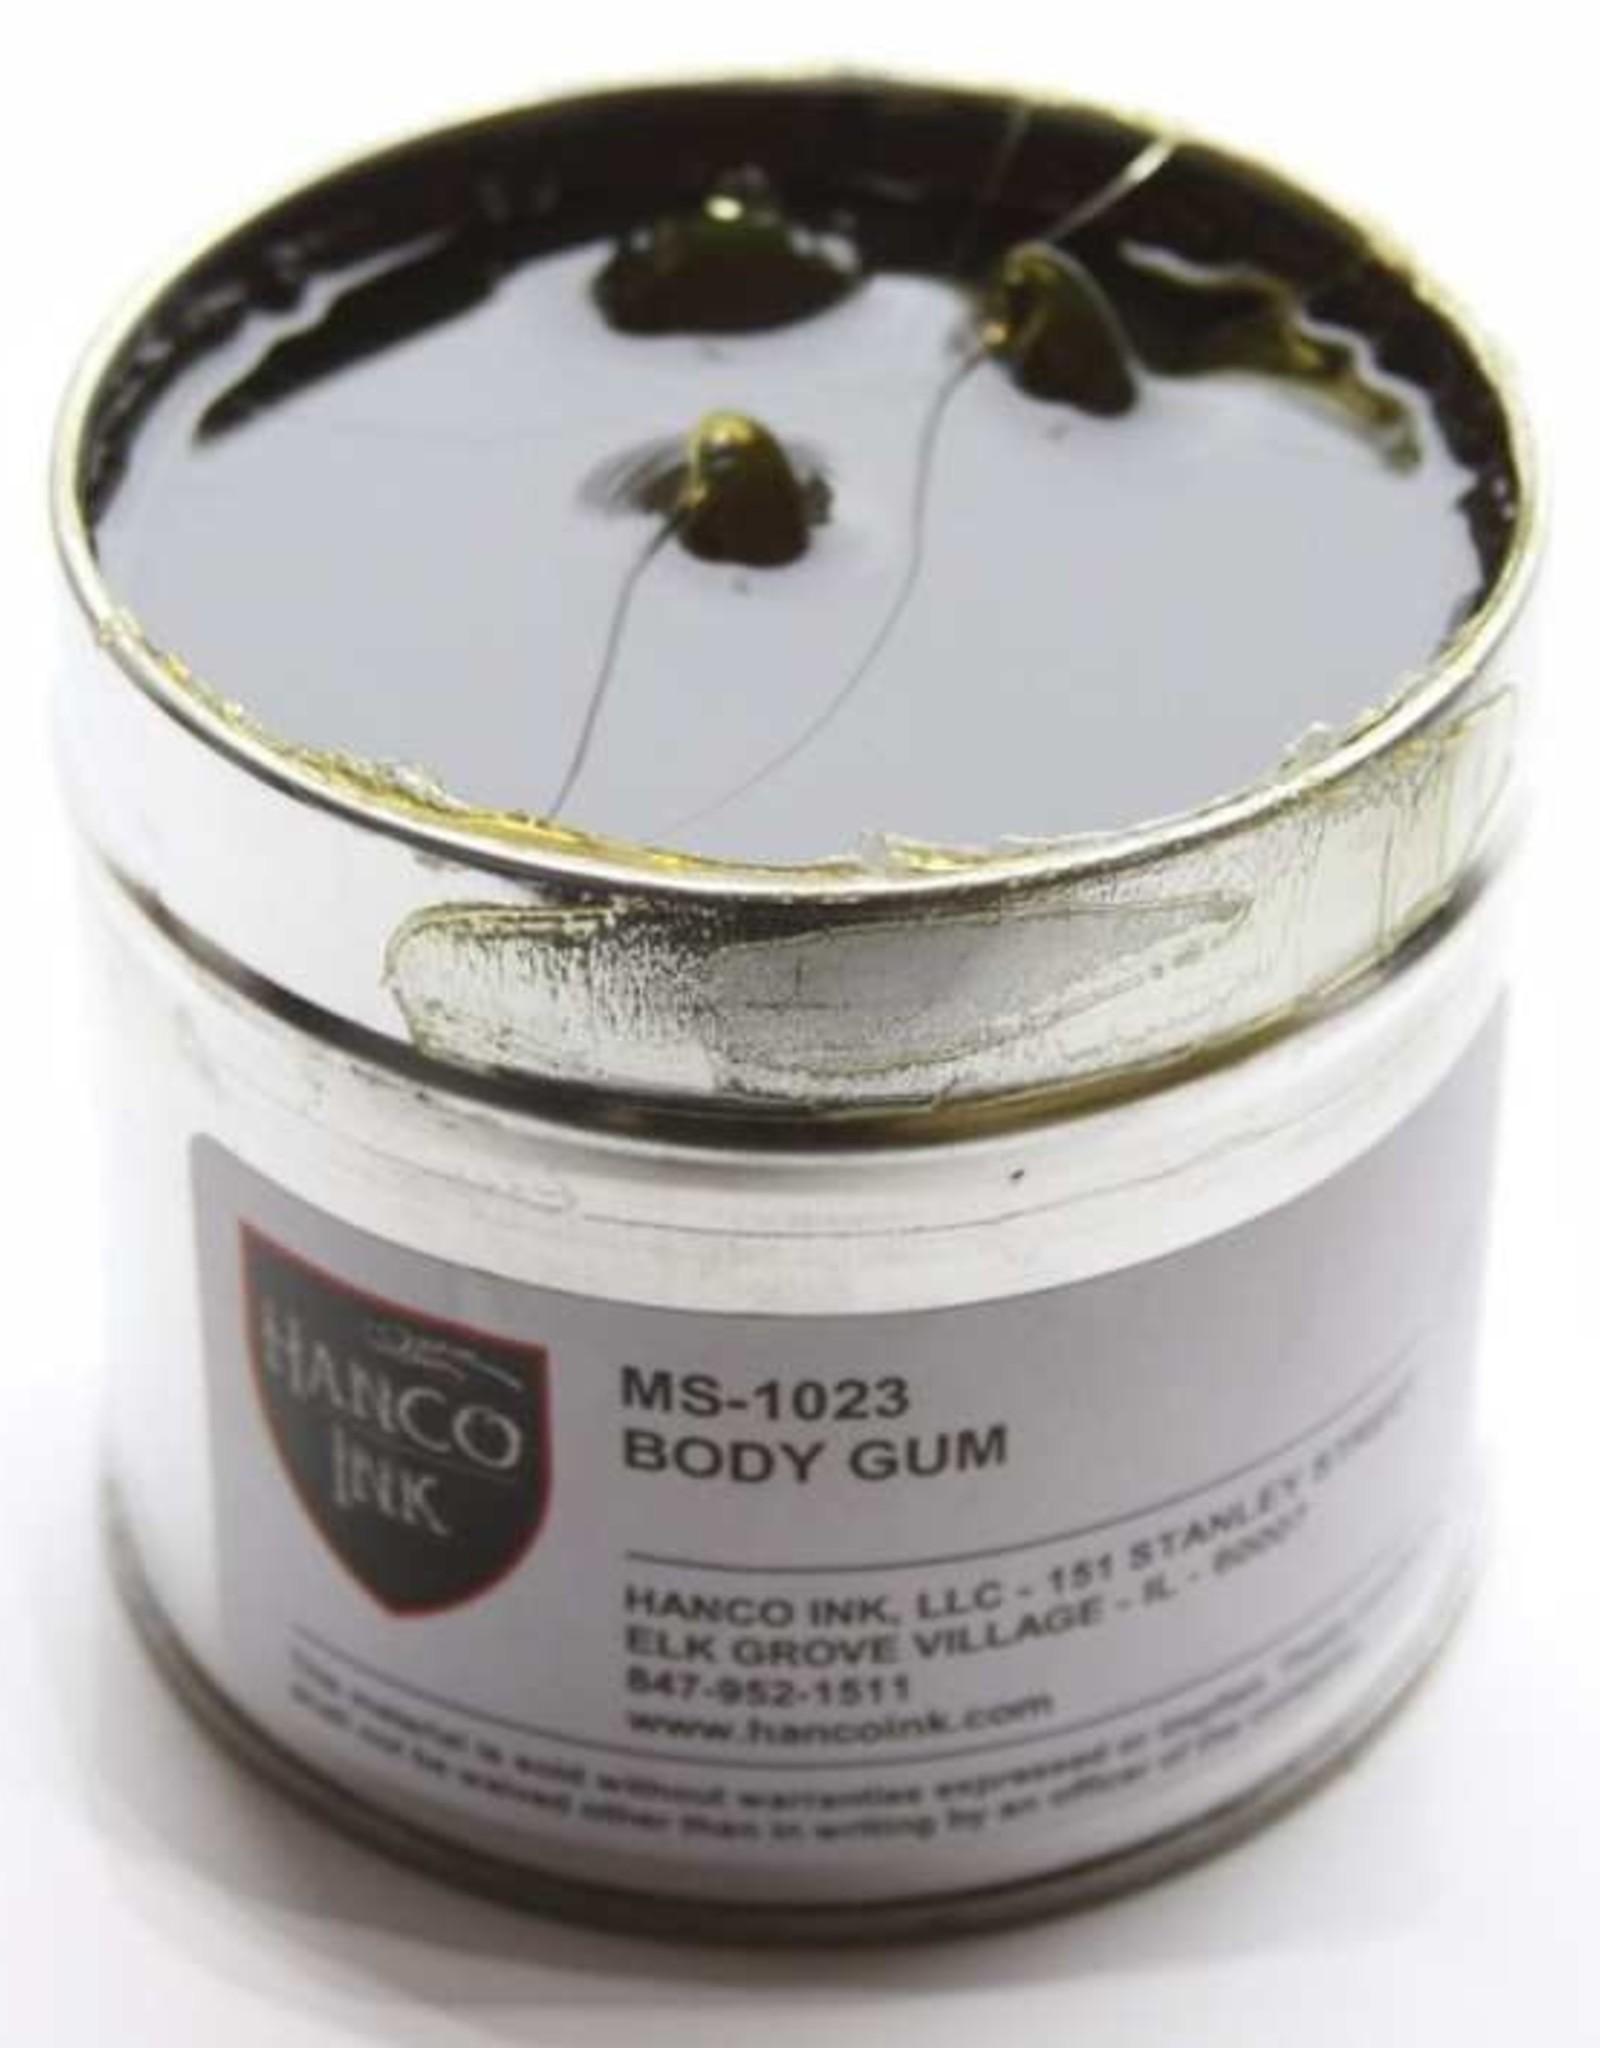 Hanco Hanco Body Gum, 25-2600 (MS-1023), blik 0,5 kg